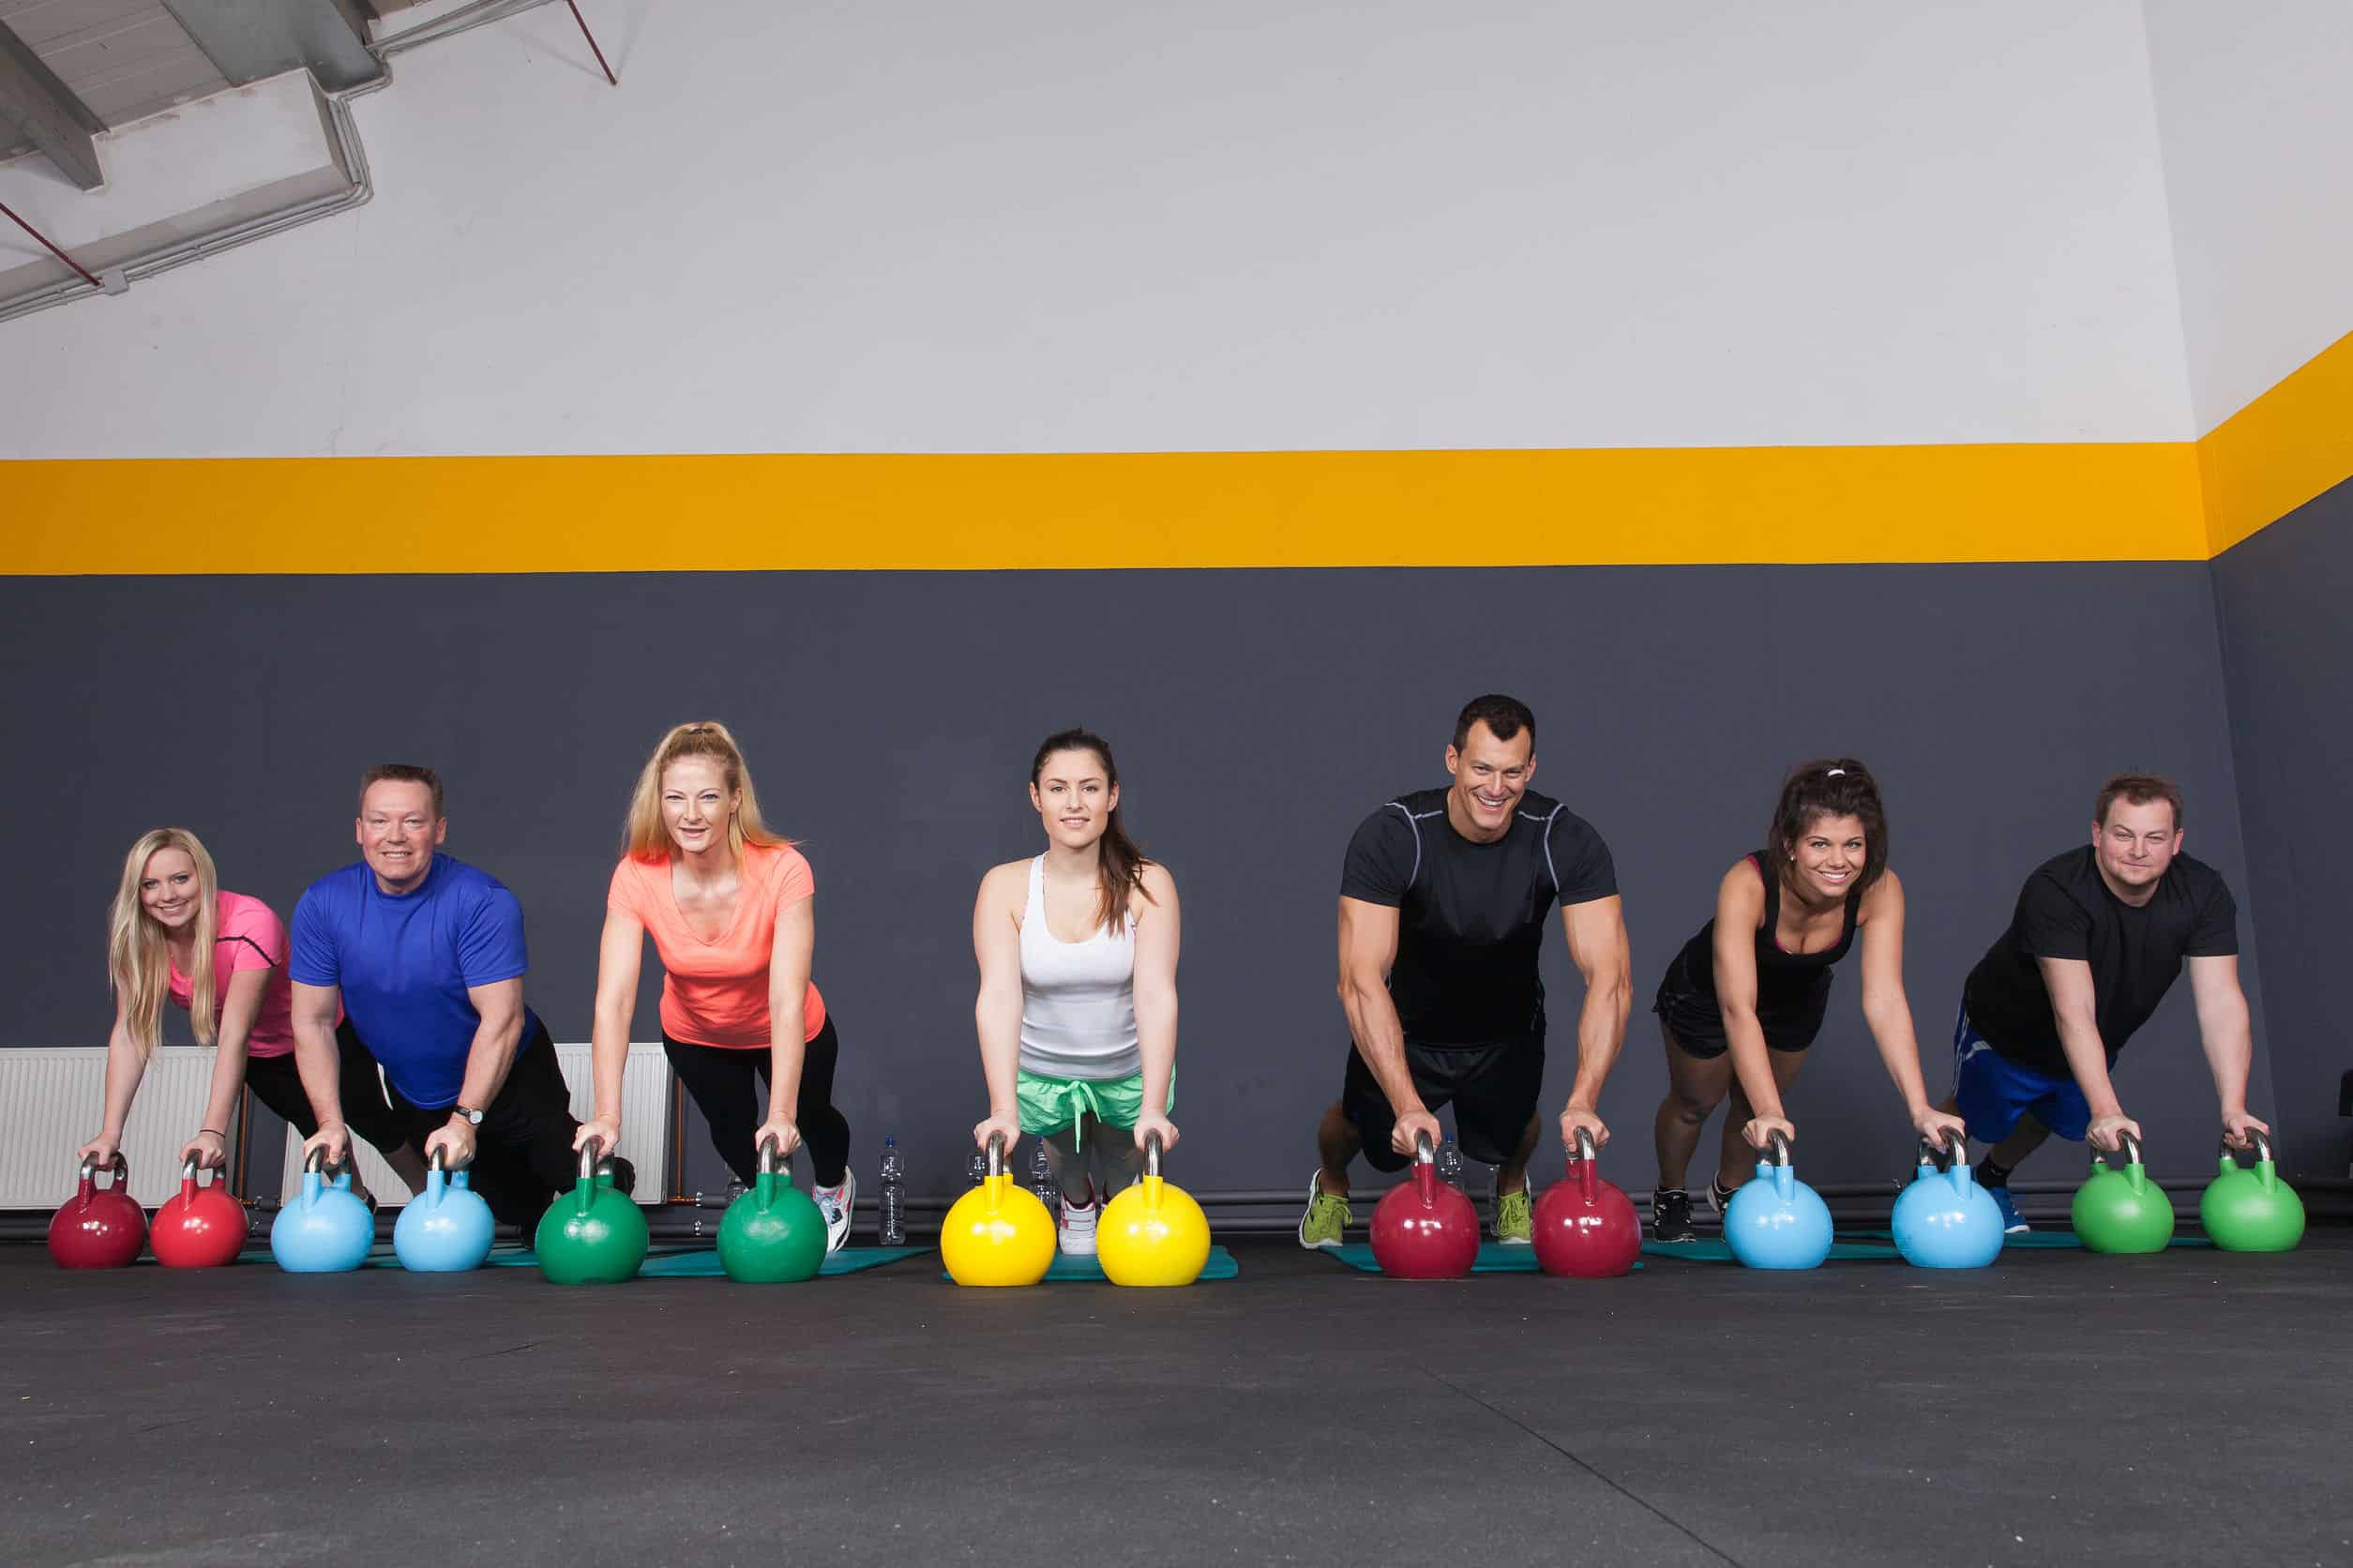 Tomar un riesgo Ceder colonia  Top CrossFit Gyms in London - London Relocation